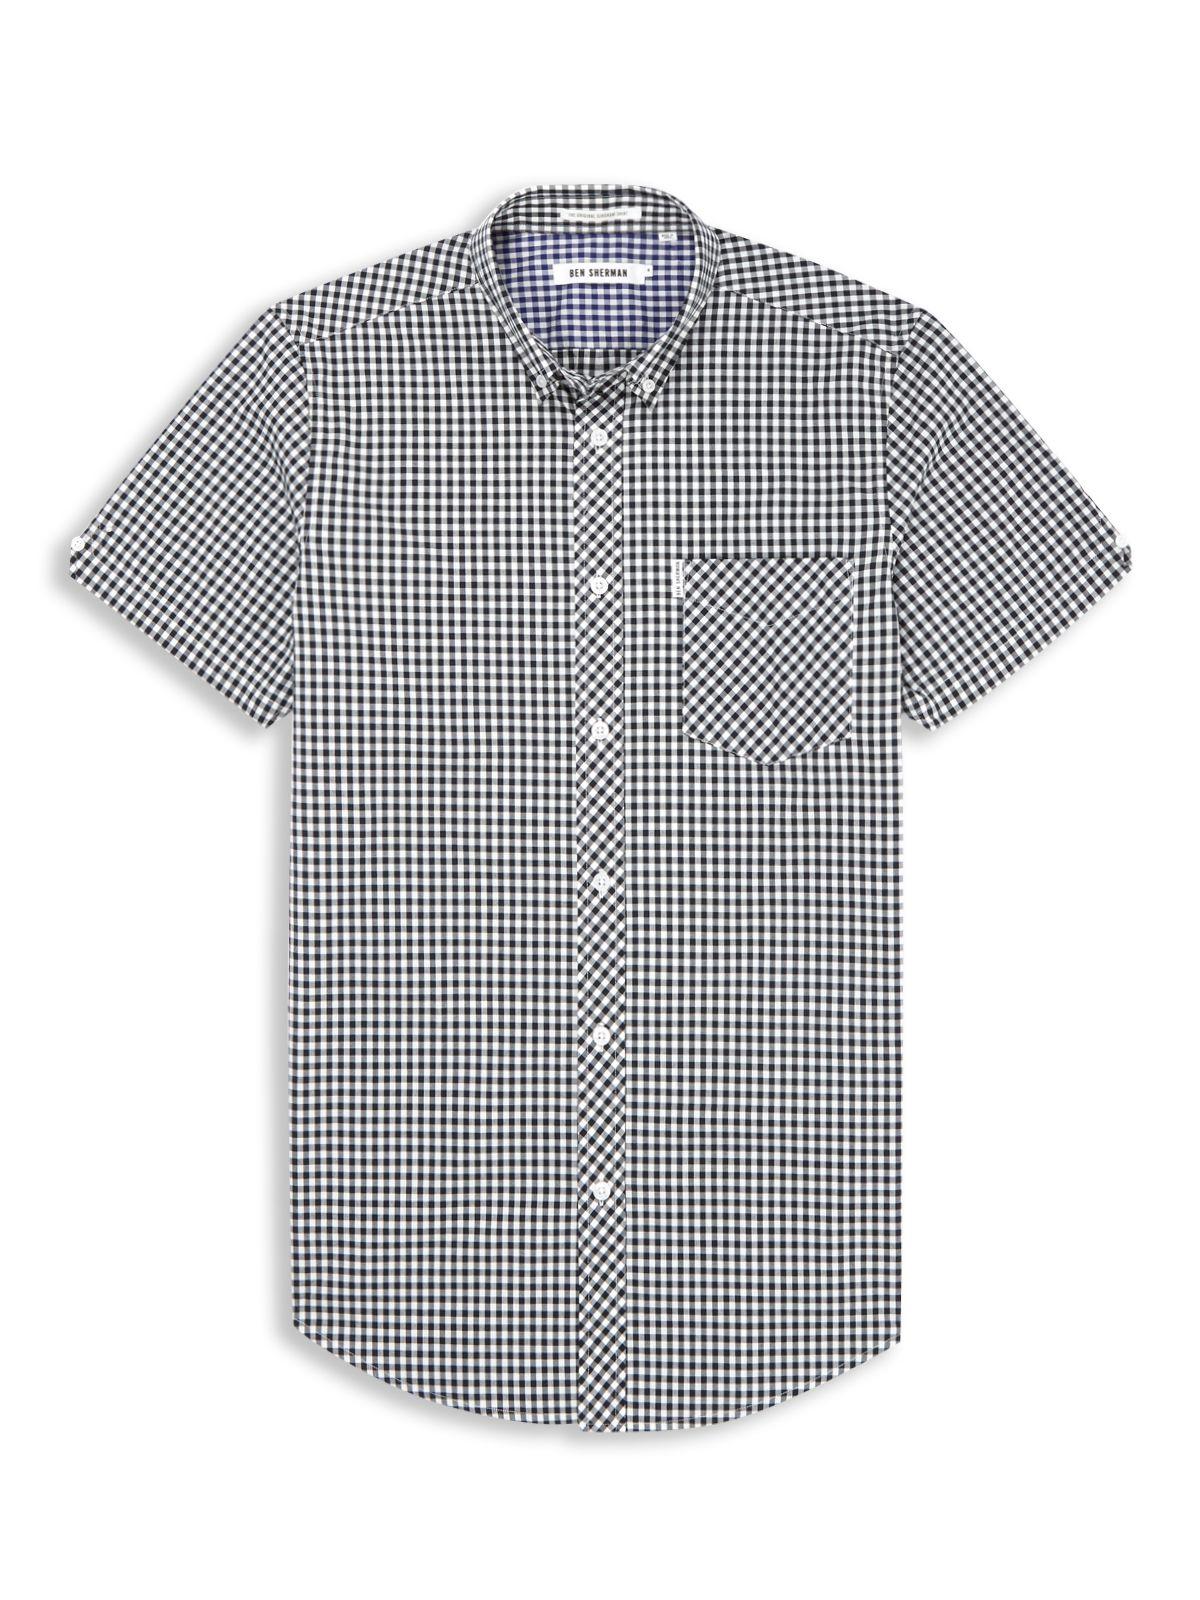 Lyst Ben Sherman Classic Gingham Check Shirt In Blue For Men